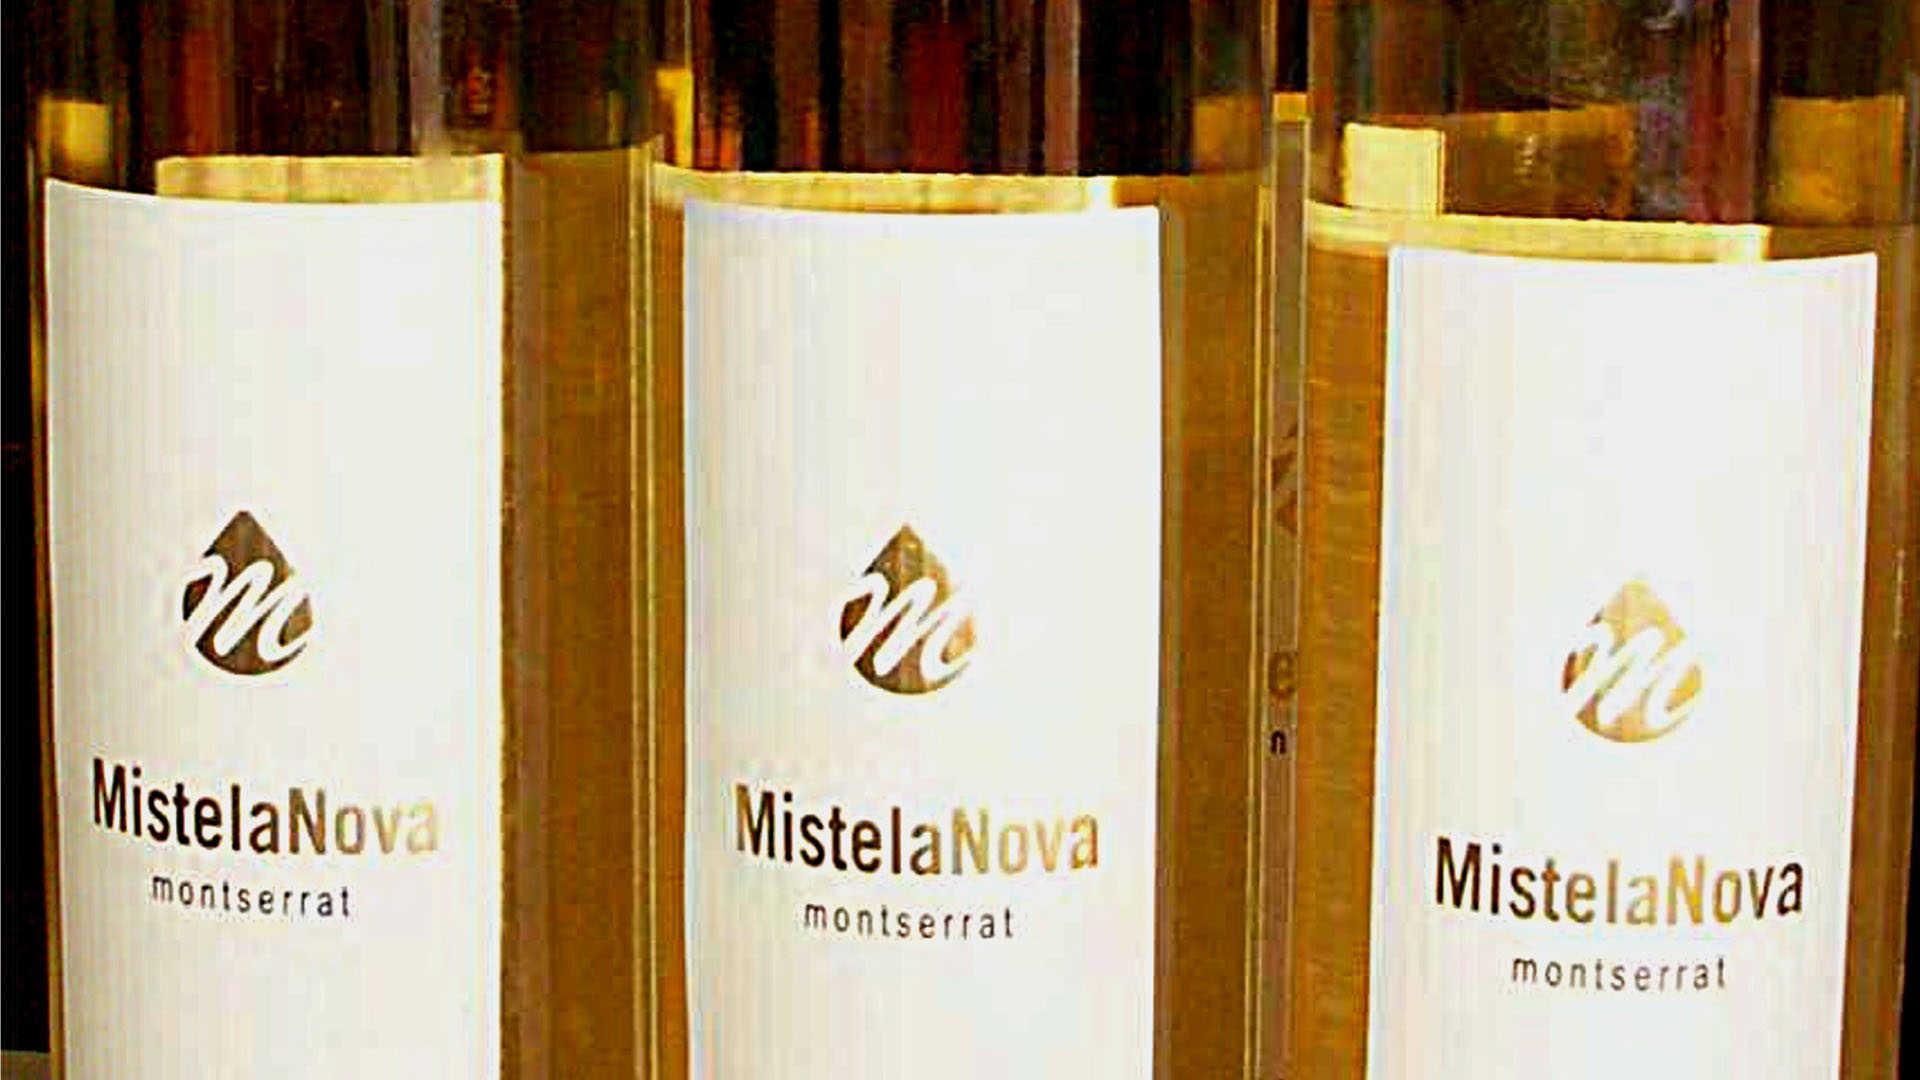 https://multimedia.comunitatvalenciana.com/76873F6388434AE6AE2B77A1E770A9CE/img/3DE0C7A24214441C939DF601024BE102/Montserrat_gastronomia.Mistela_1.jpg?responsive